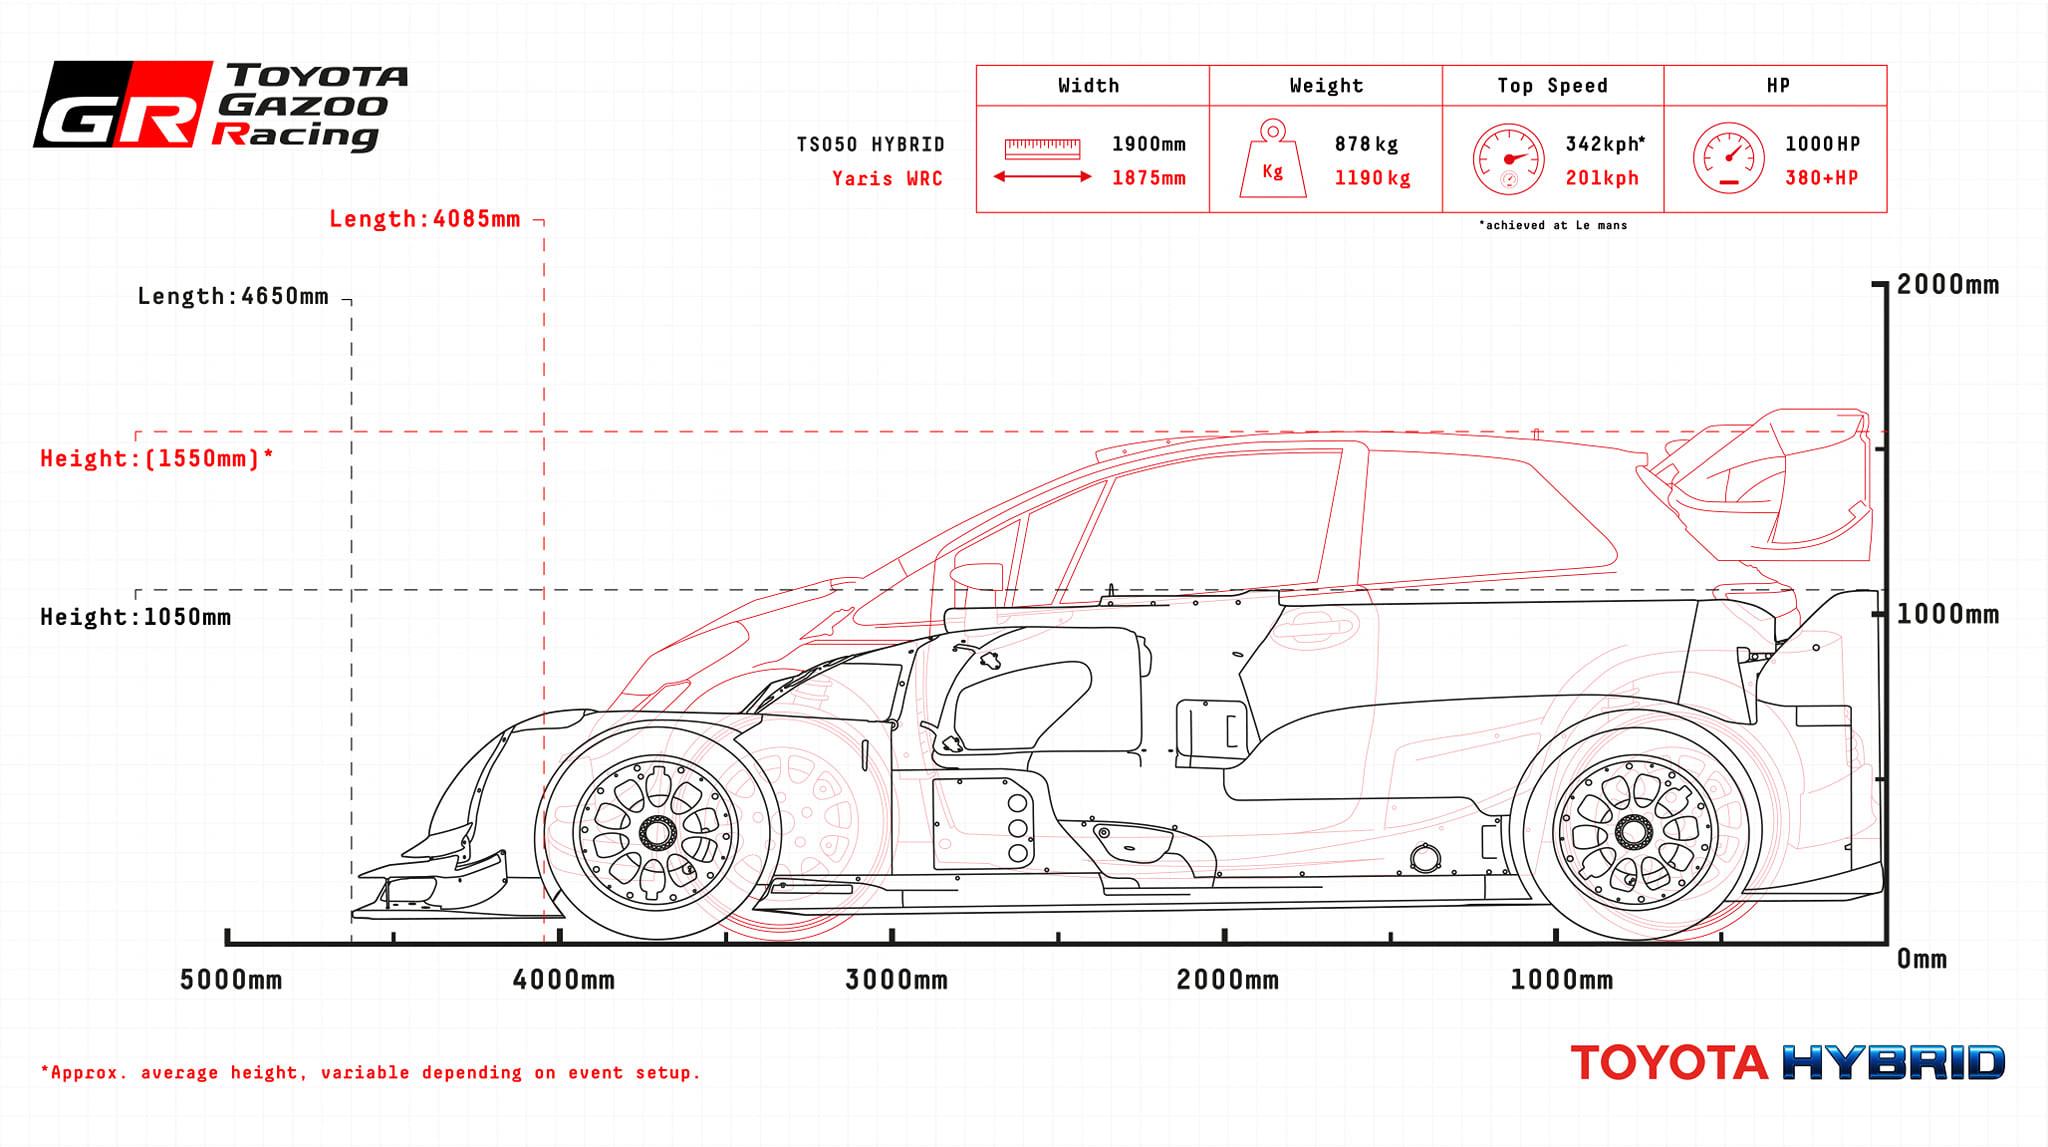 Comparison: TS050 Hybrid vs WRC Yaris | Phil Gilbert Toyota